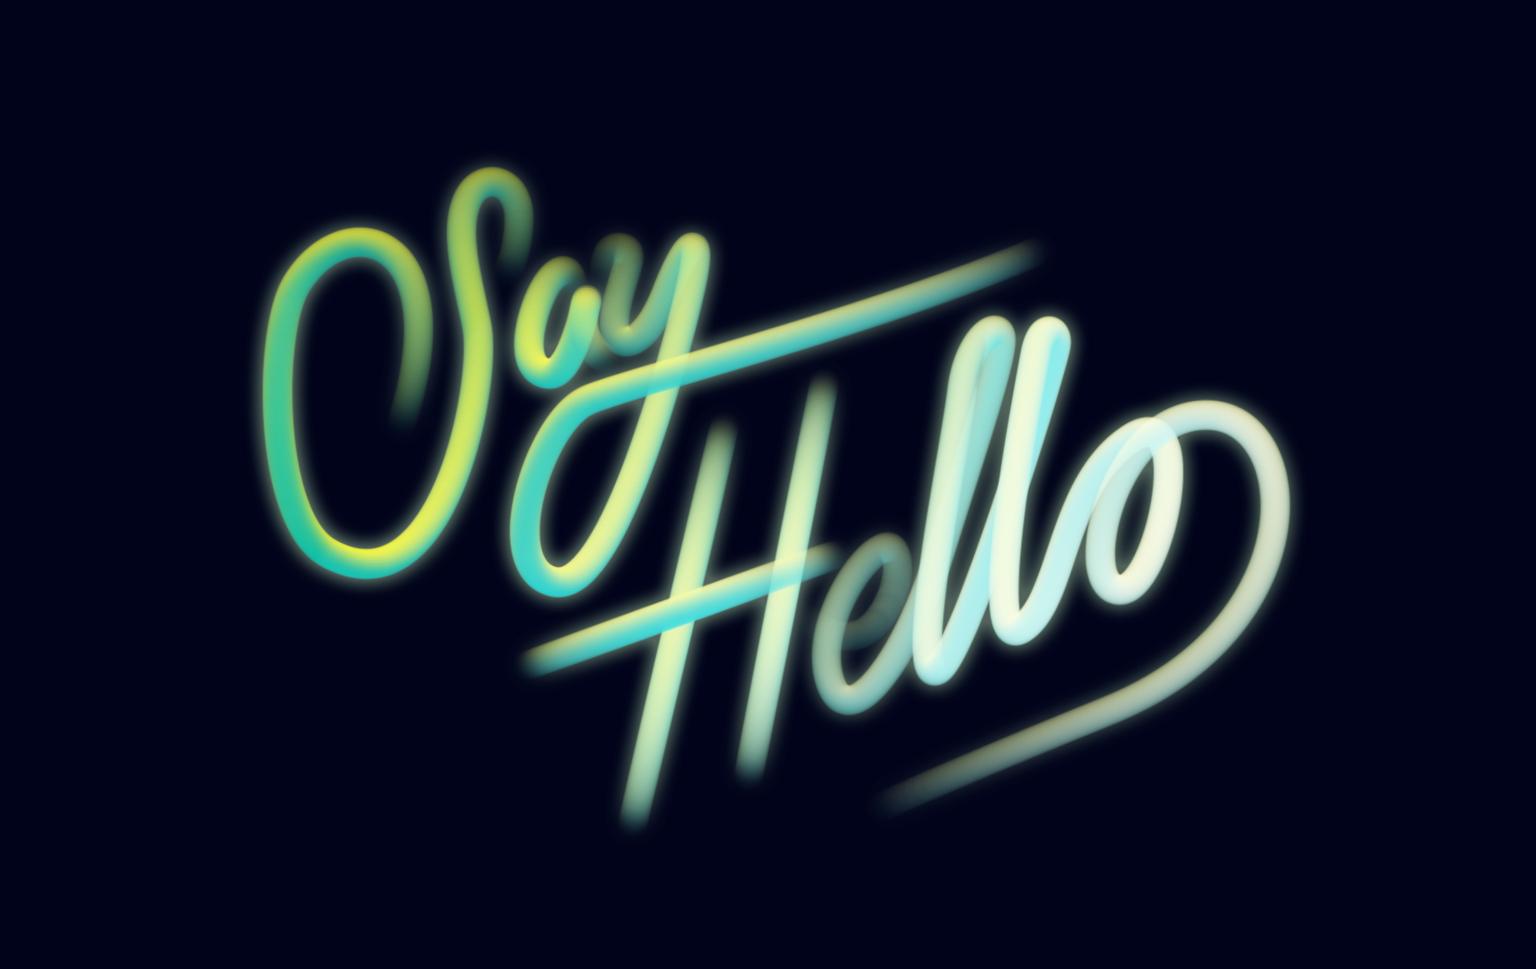 Say_hello.png